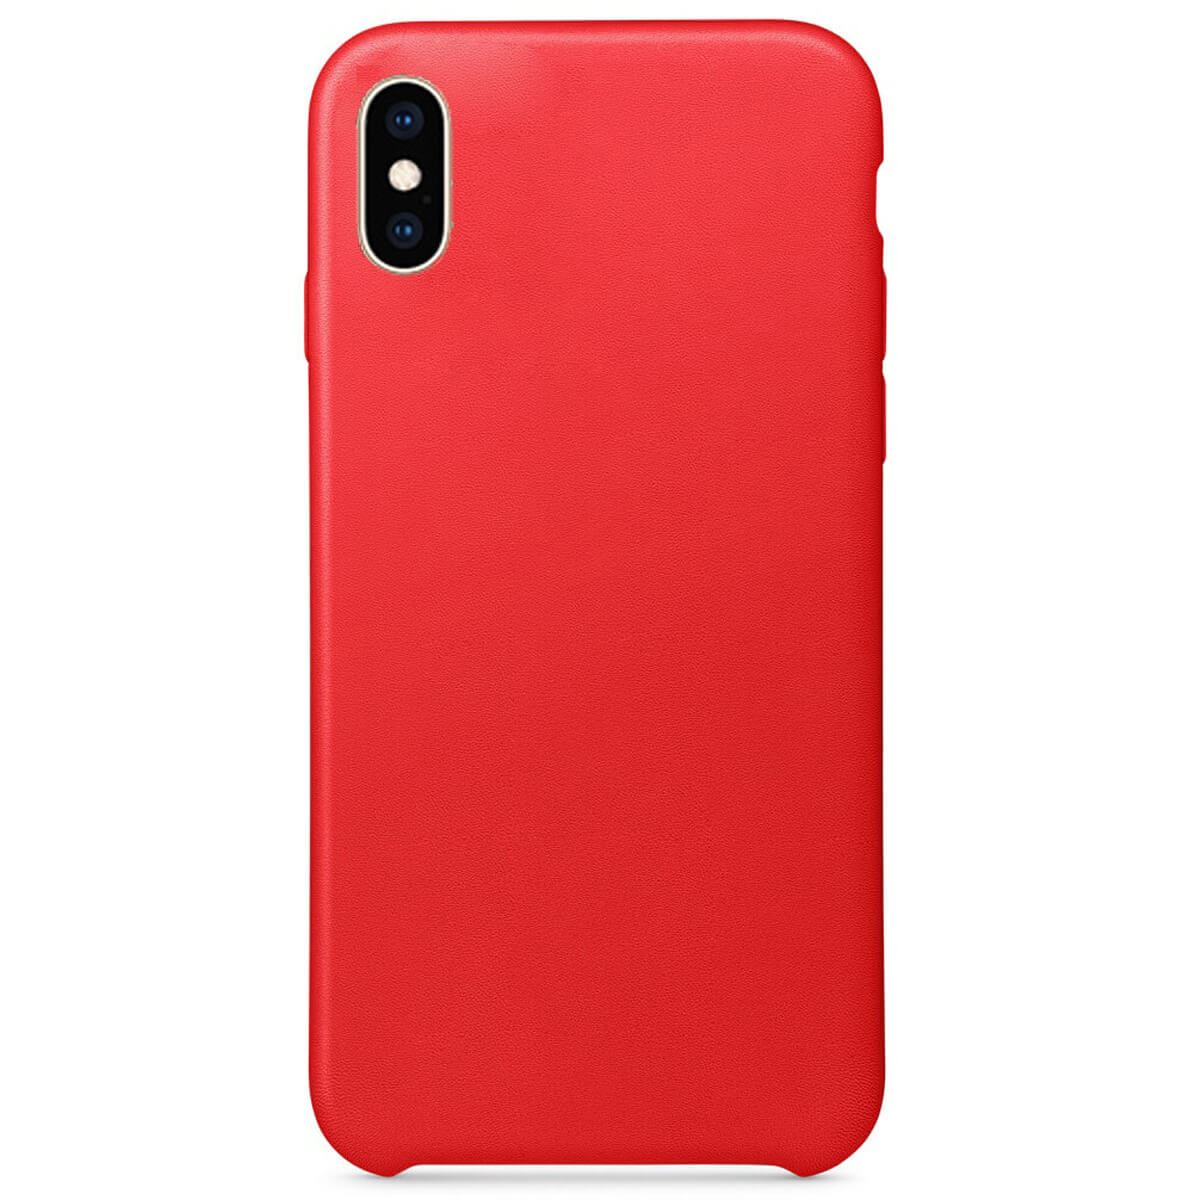 Leather-Slim-Case-Apple-iPhone-10-8-7-Plus-6s-5-Original-PU-Soft-Silicone-Cover thumbnail 22